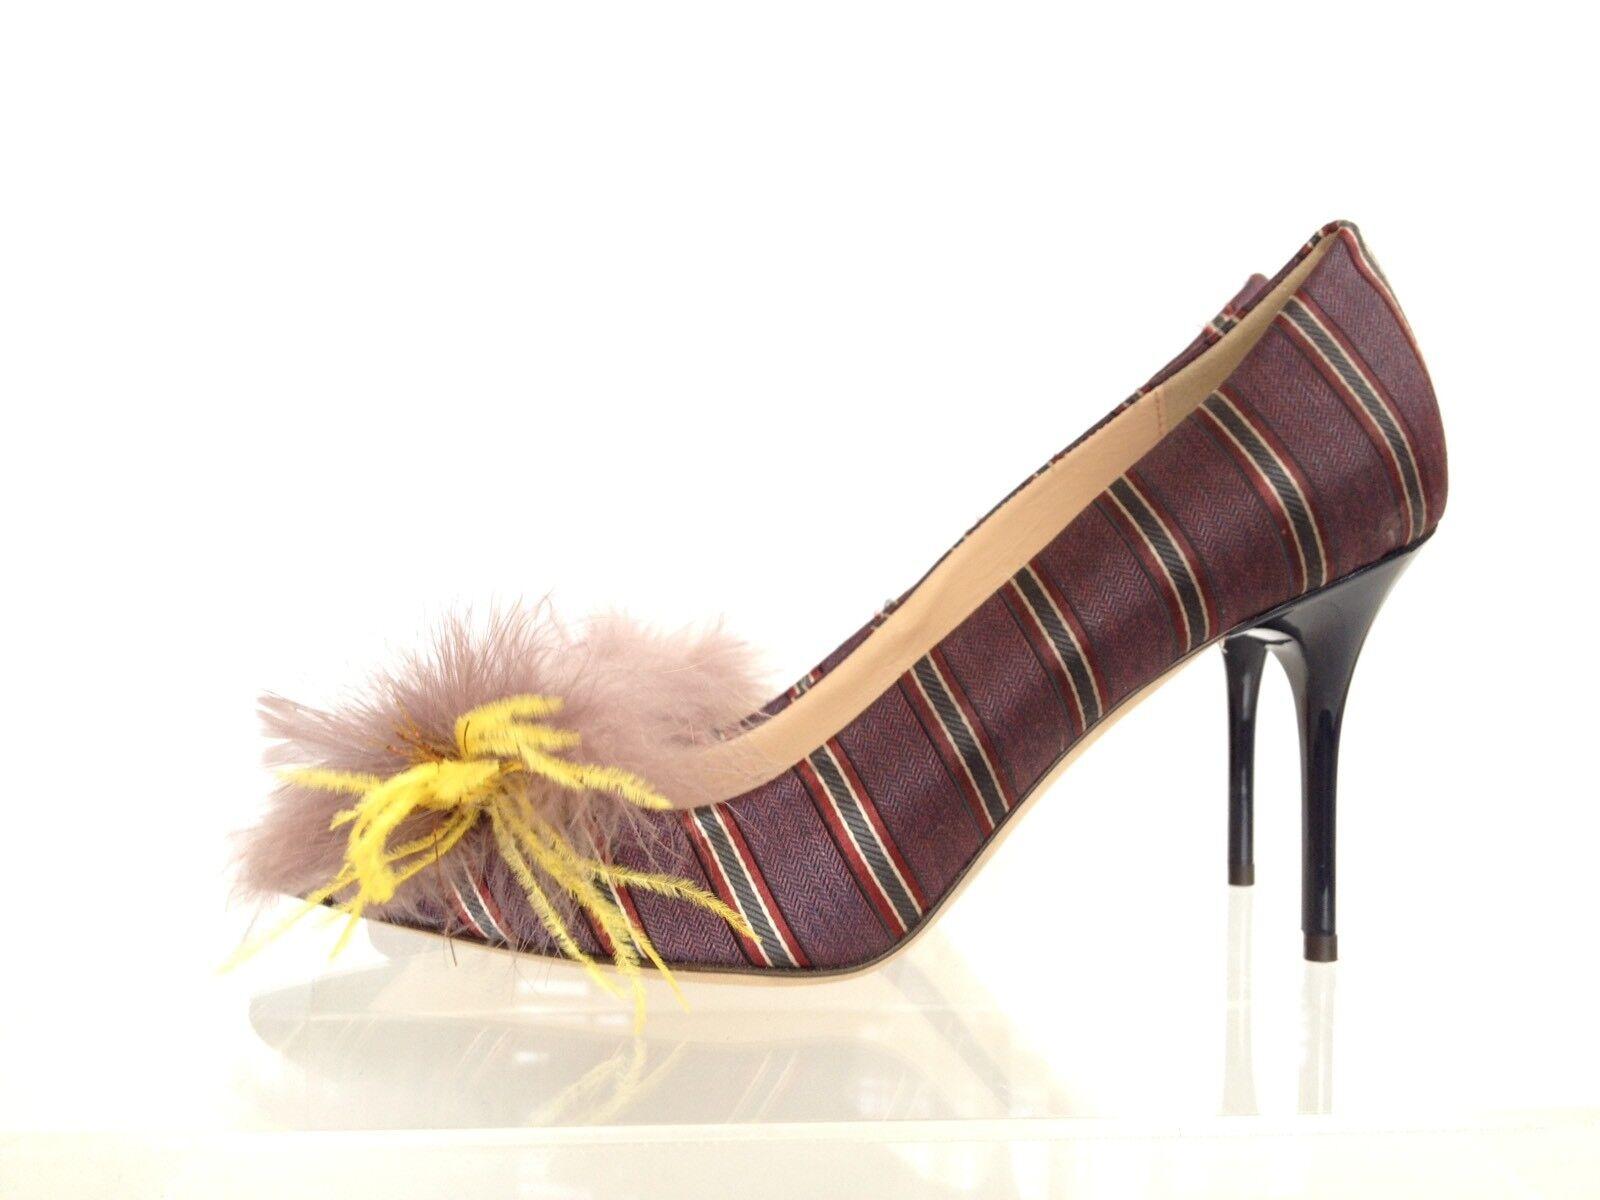 J.CREW Collection Elsie Pumps in Stripe 7 Berry Violet e0783  358